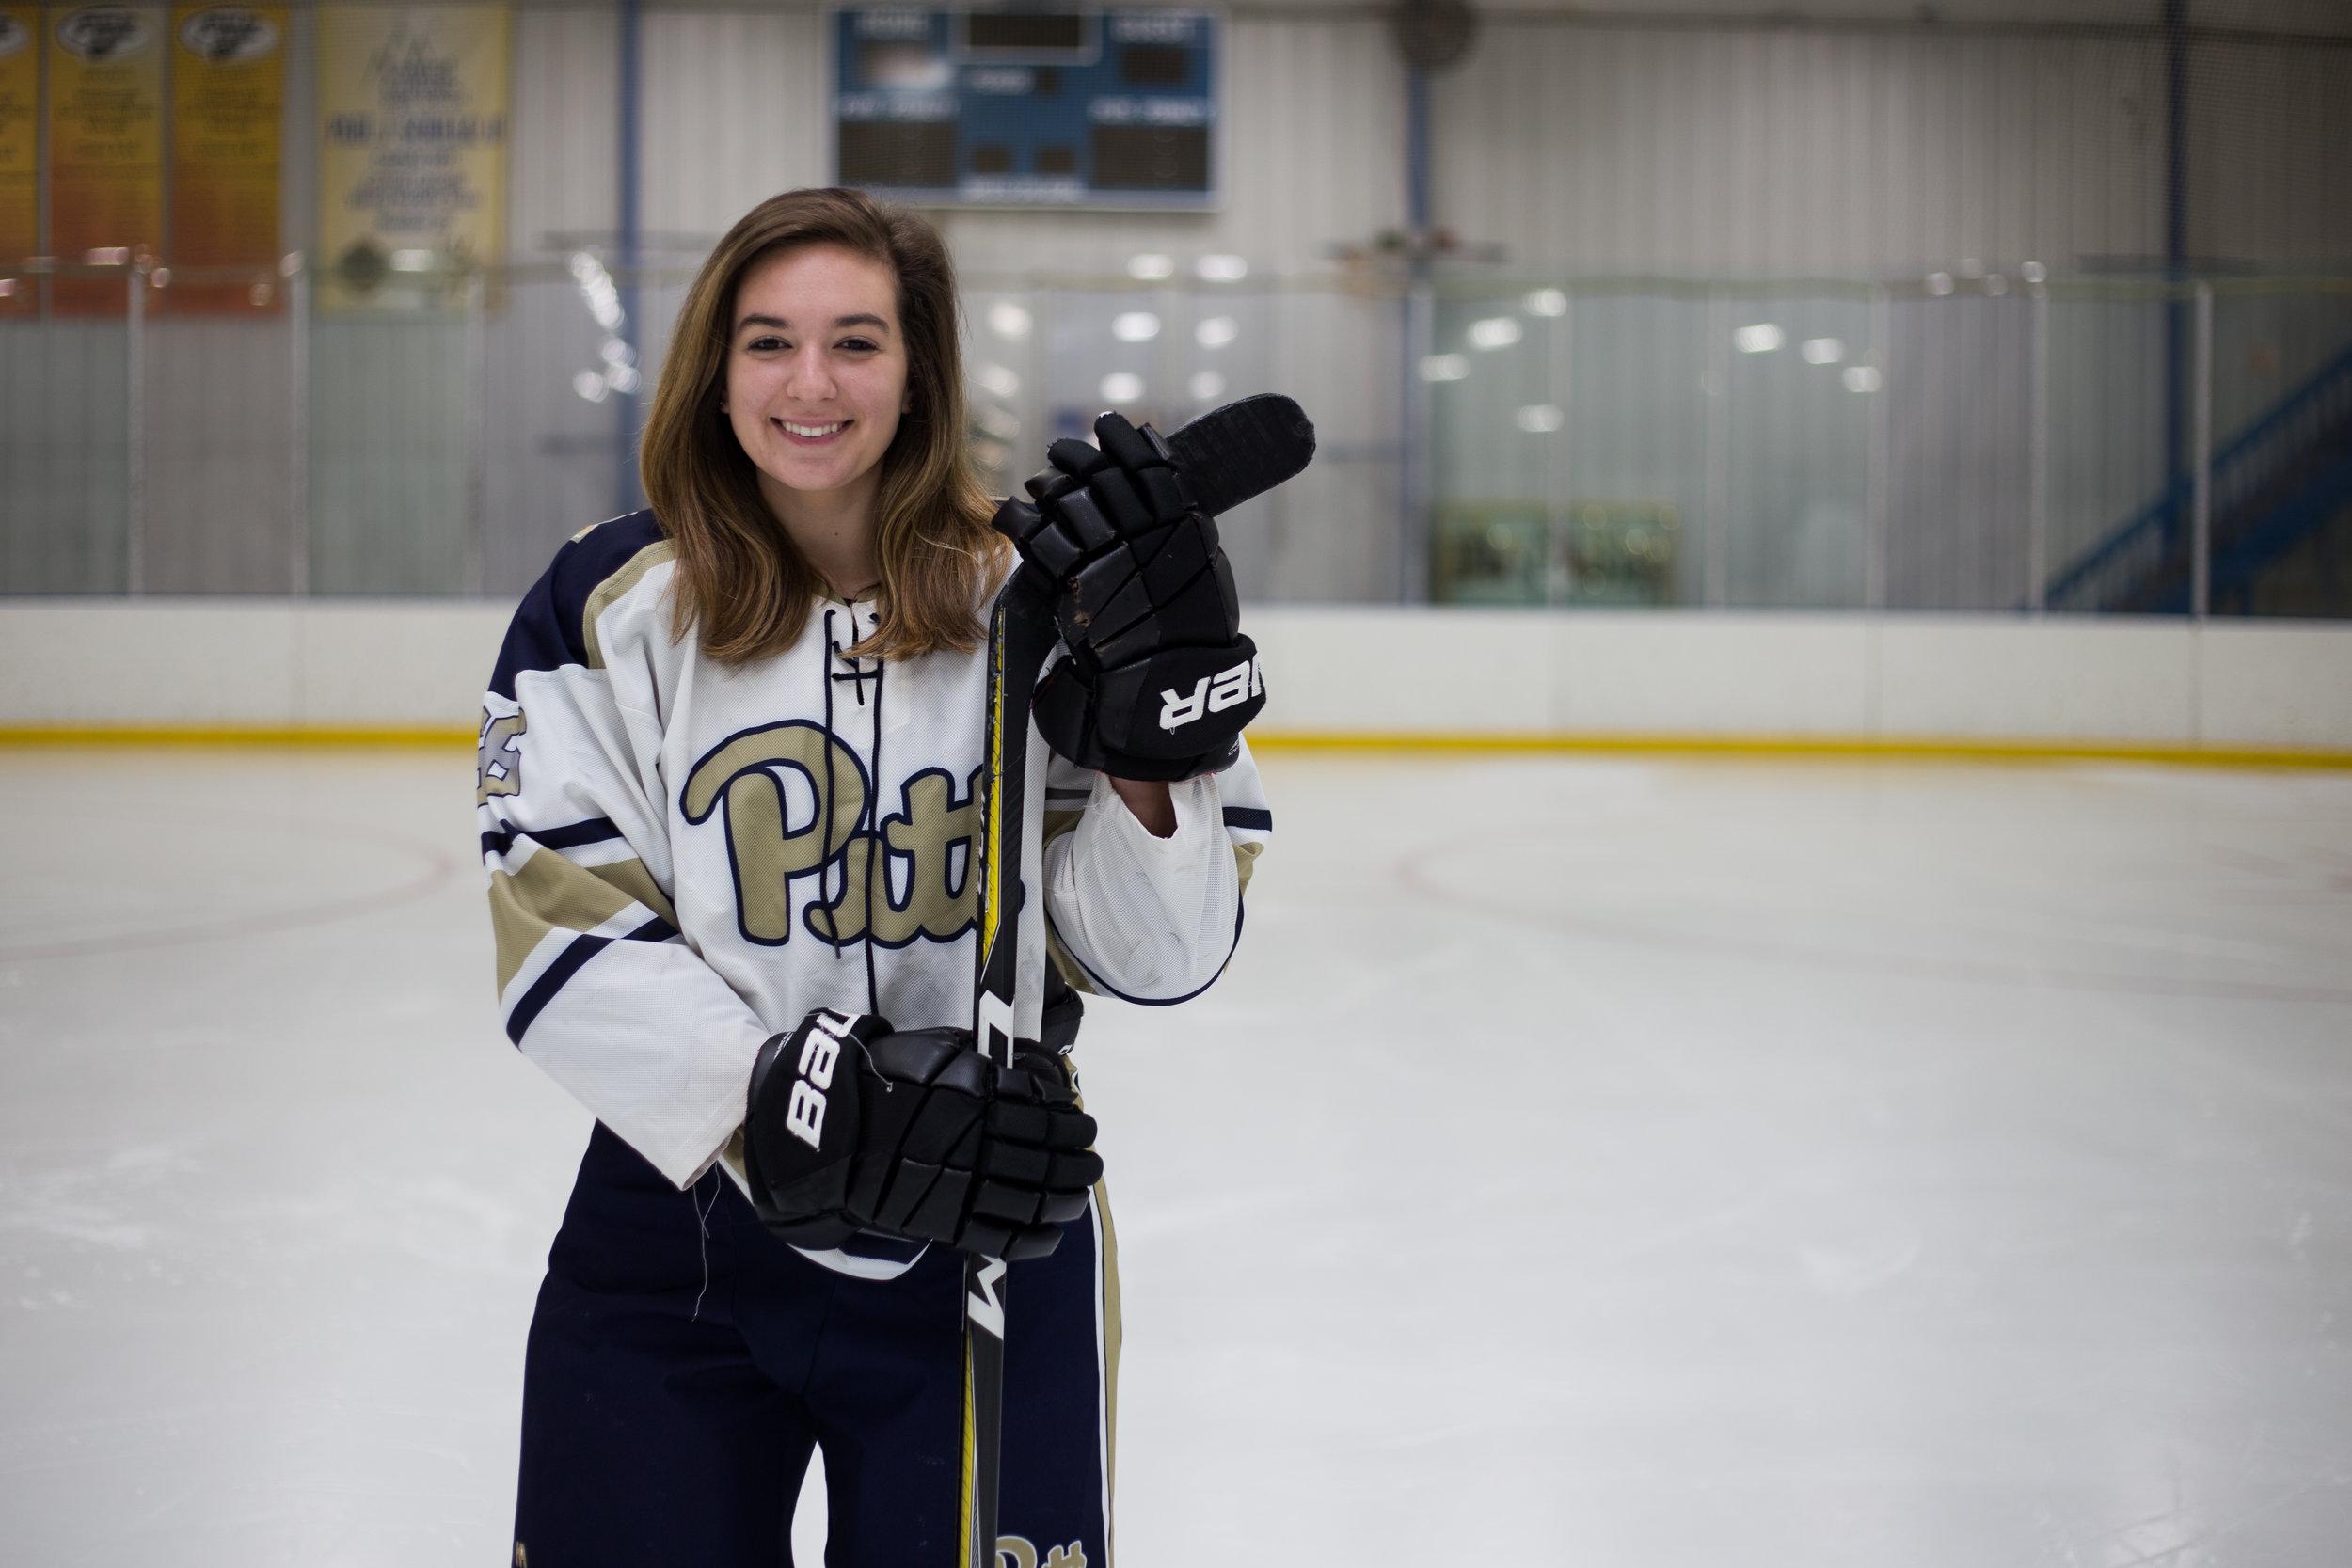 hockeyPortraits-14.JPG